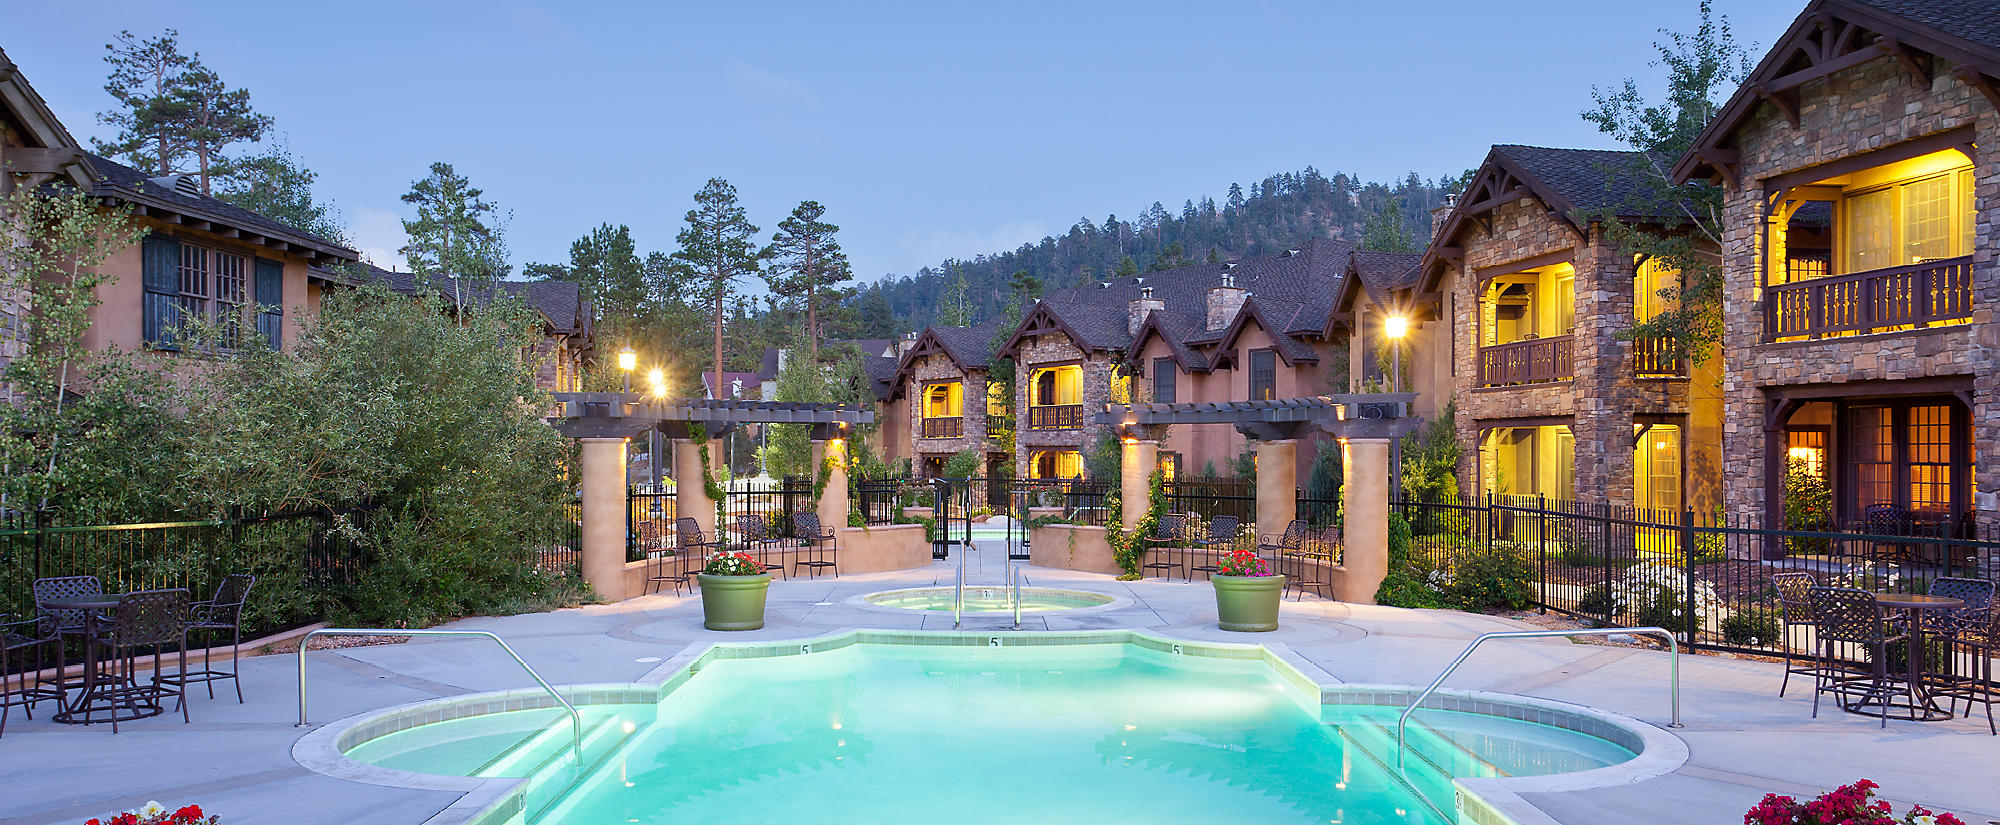 vacation in big bear lake california bluegreen vacations. Black Bedroom Furniture Sets. Home Design Ideas